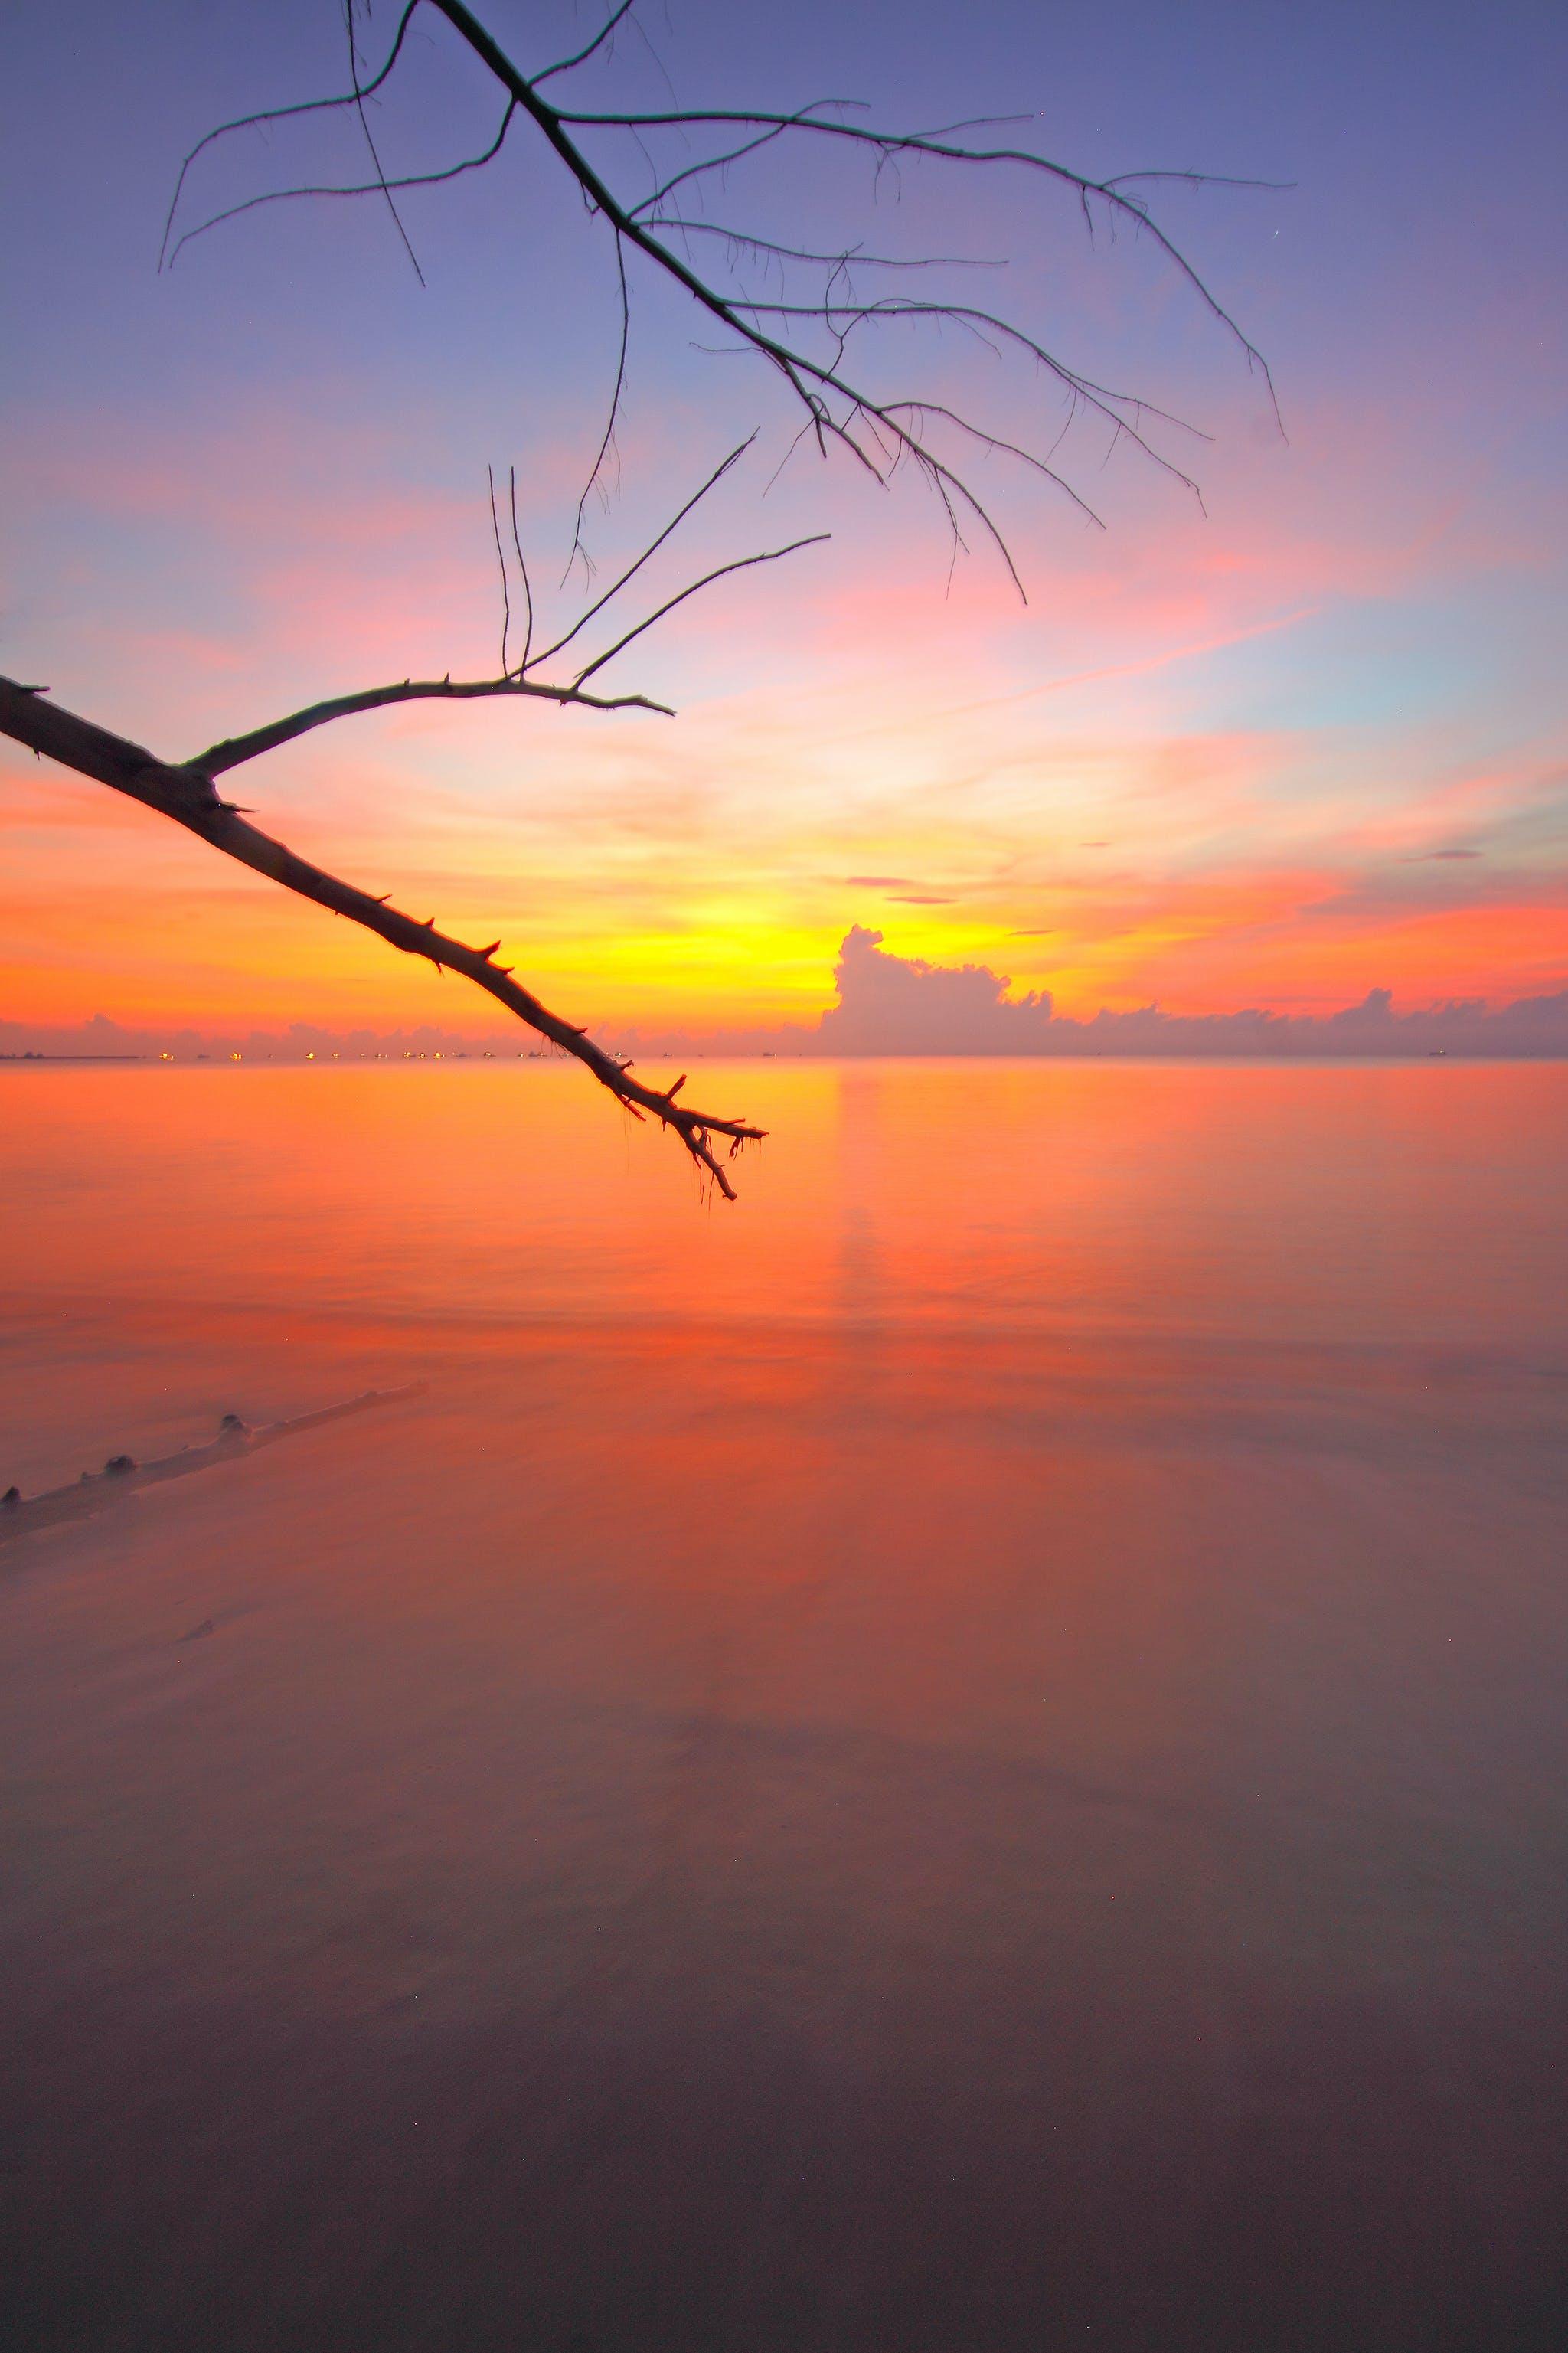 Gratis stockfoto met boom, dageraad, h2o, hemel